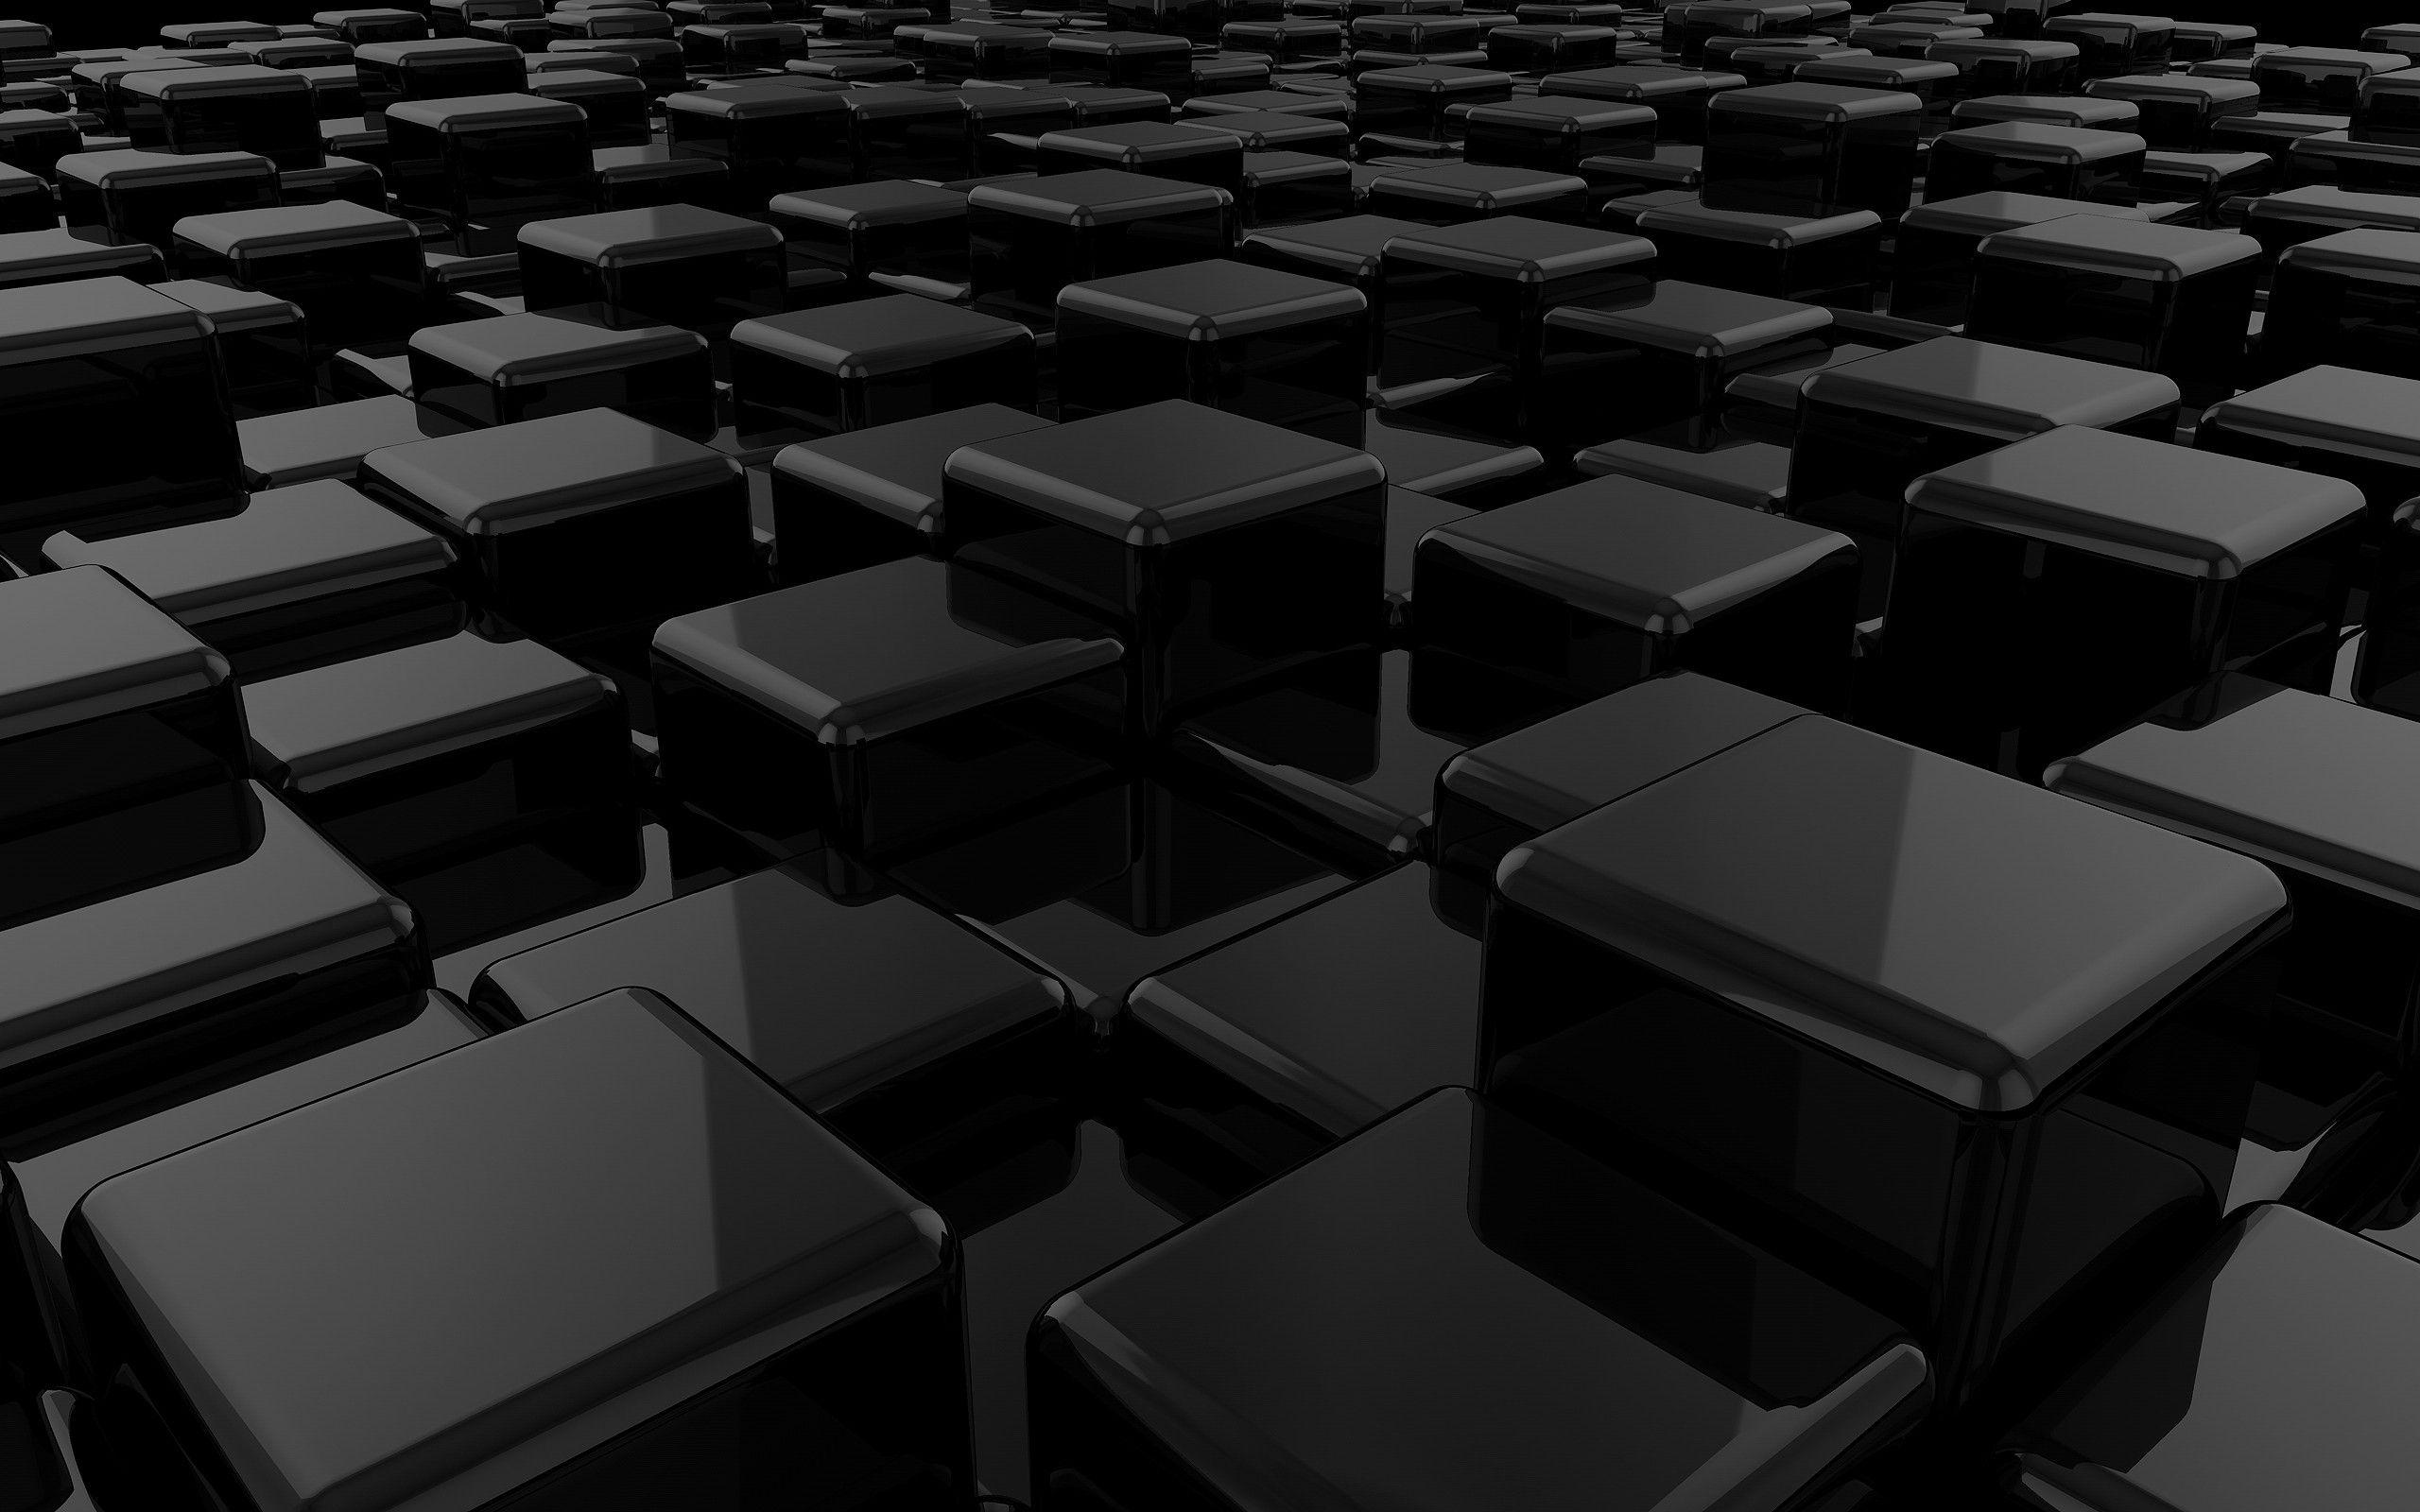 Source INTERNET Desktop WALLPAPERS Pinterest Black hd 2560x1600